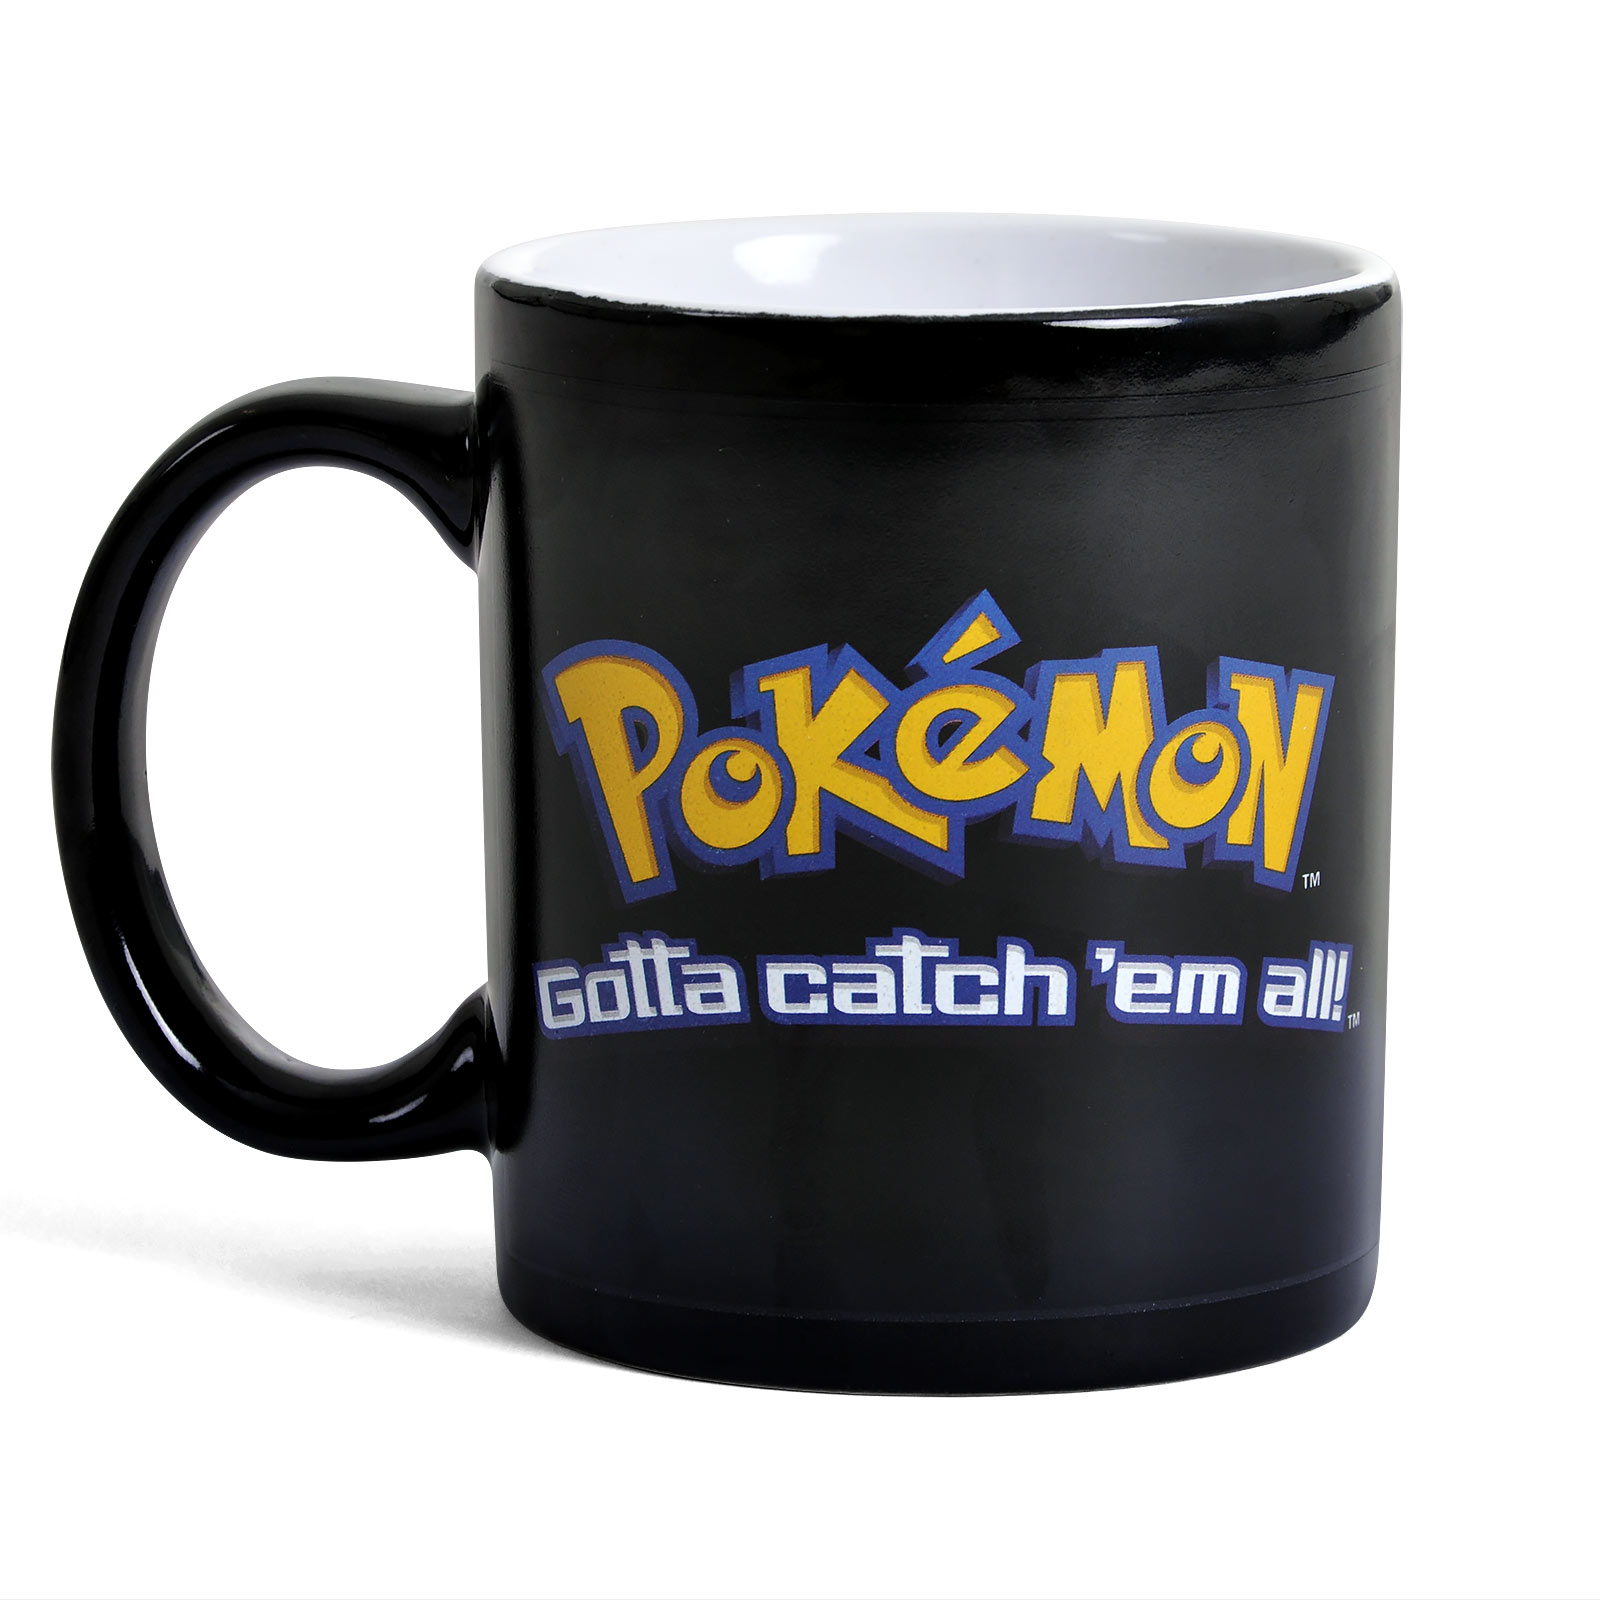 Pokemon - Pikachu Thermoeffekt Tasse